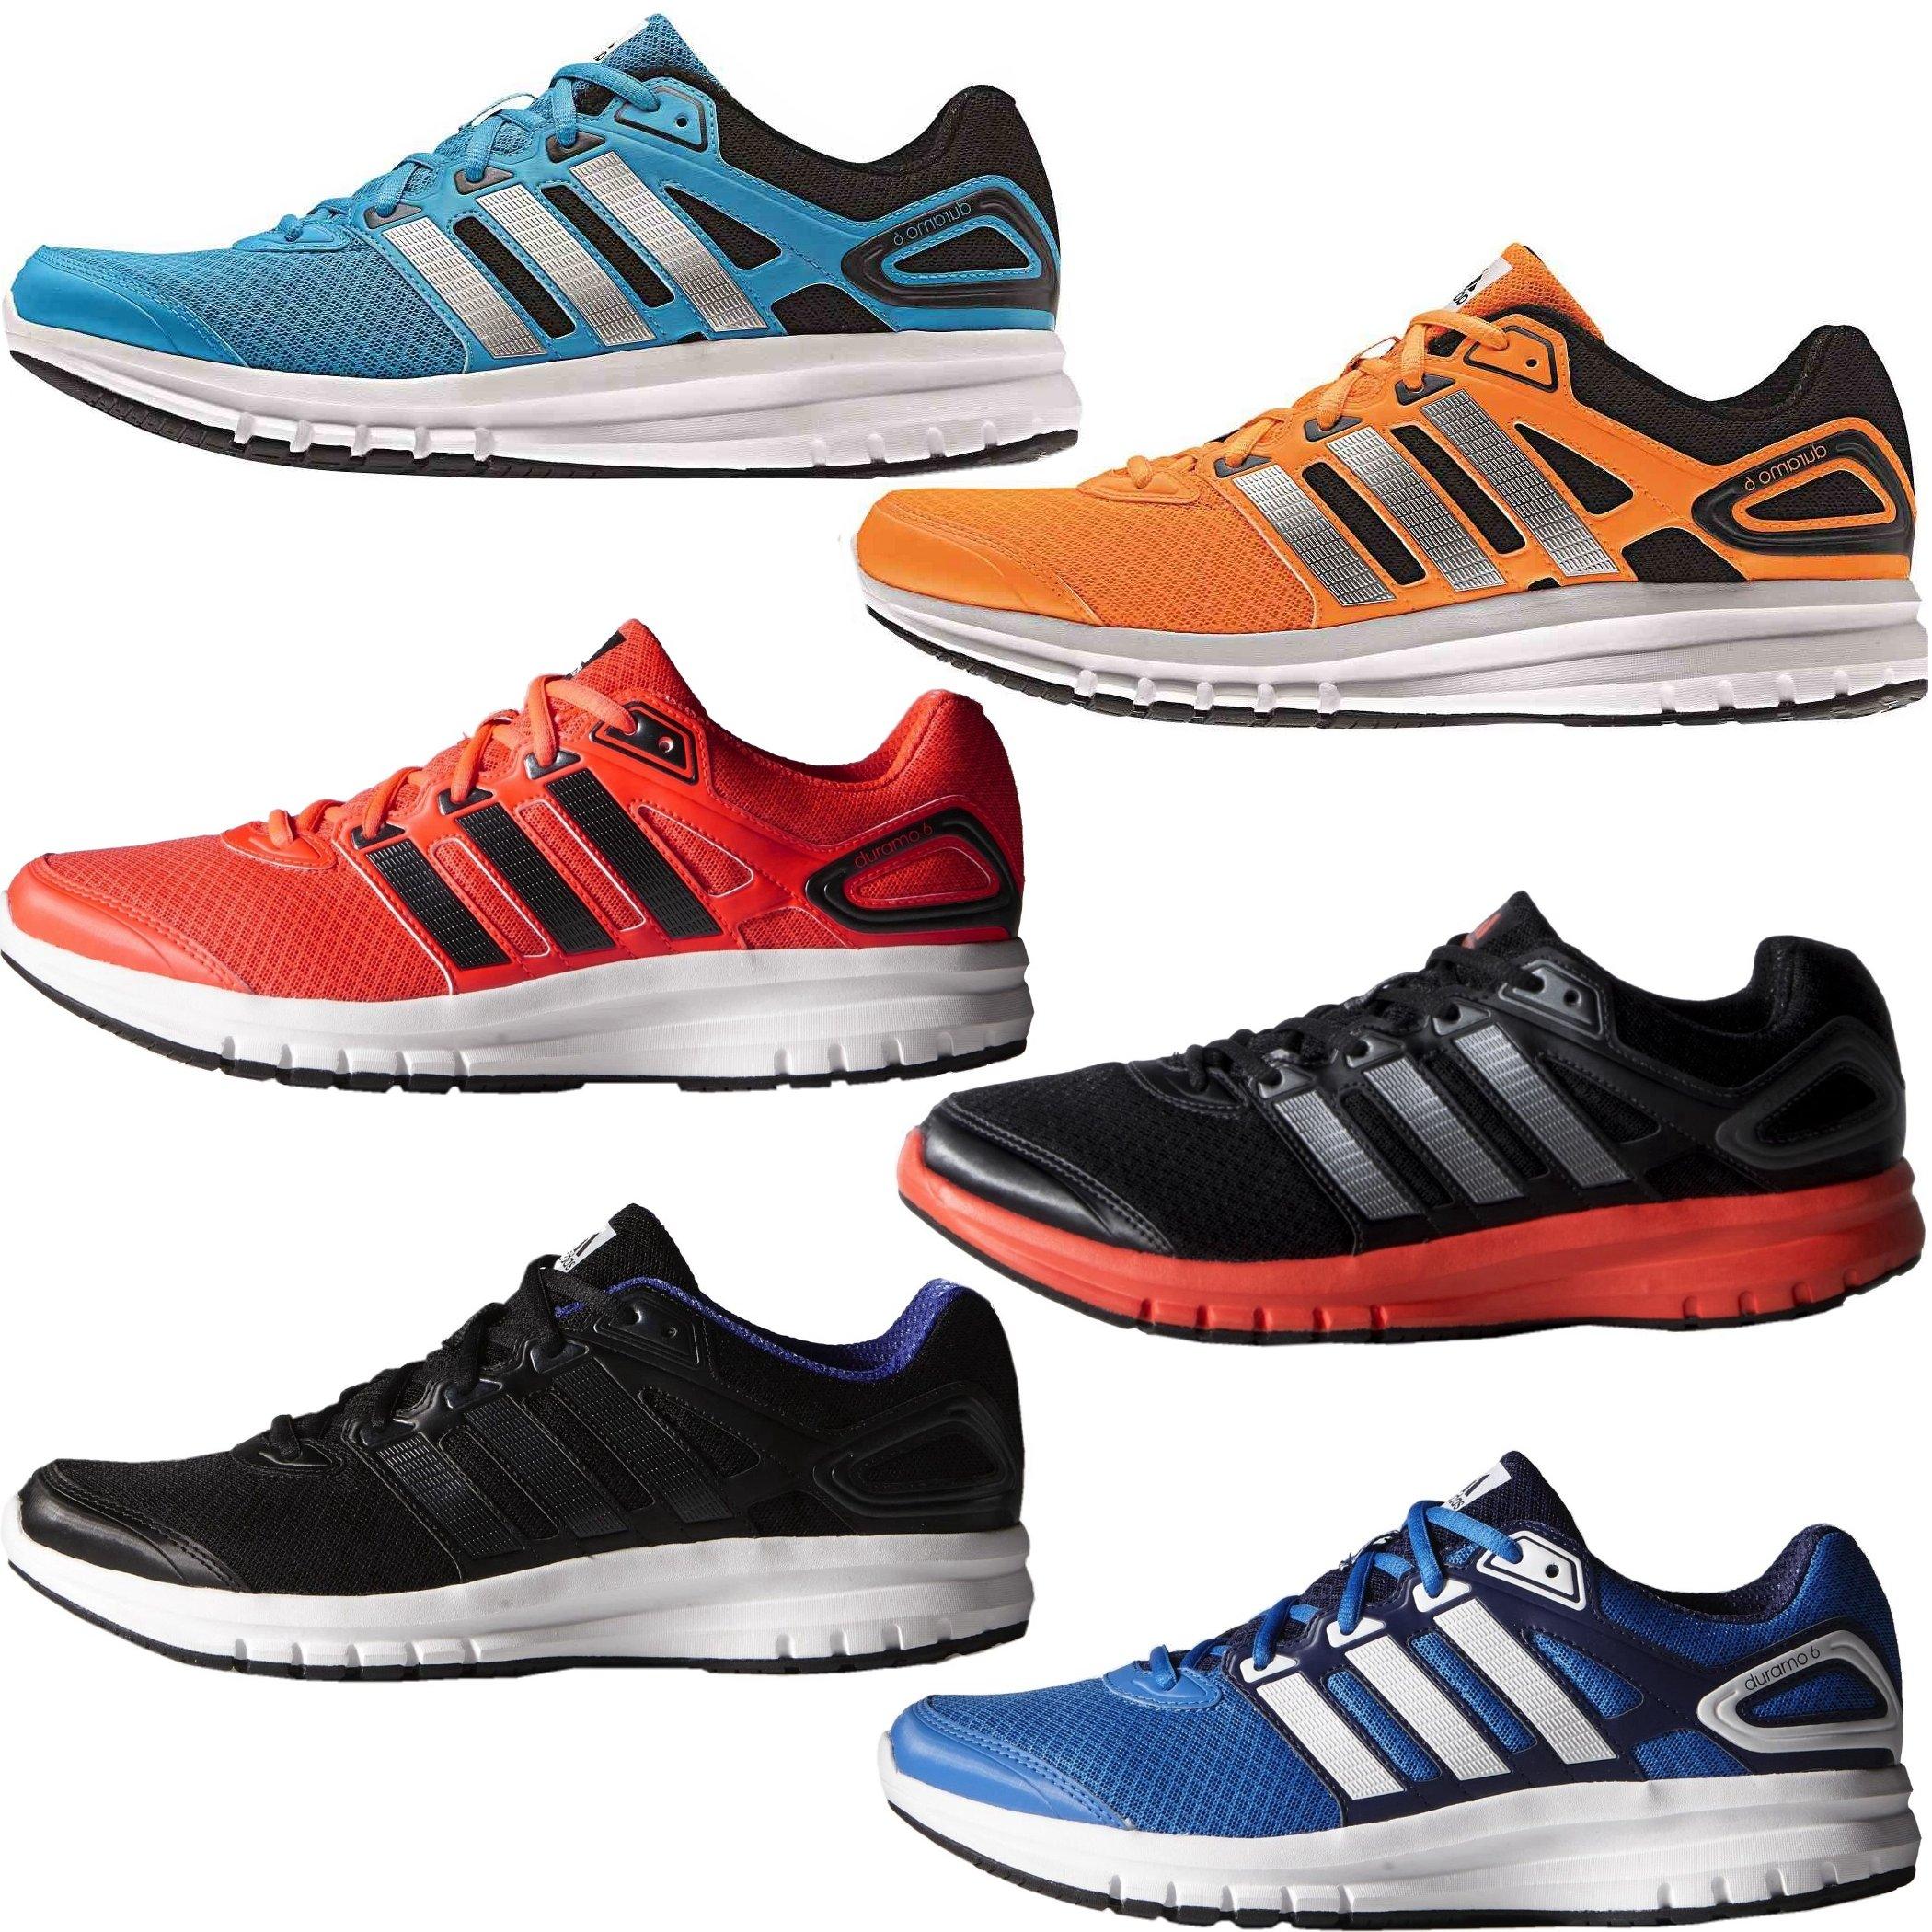 Adidas Zapatos 6 Duramo Joggingschuhe Zapatillas wpzXTpfq